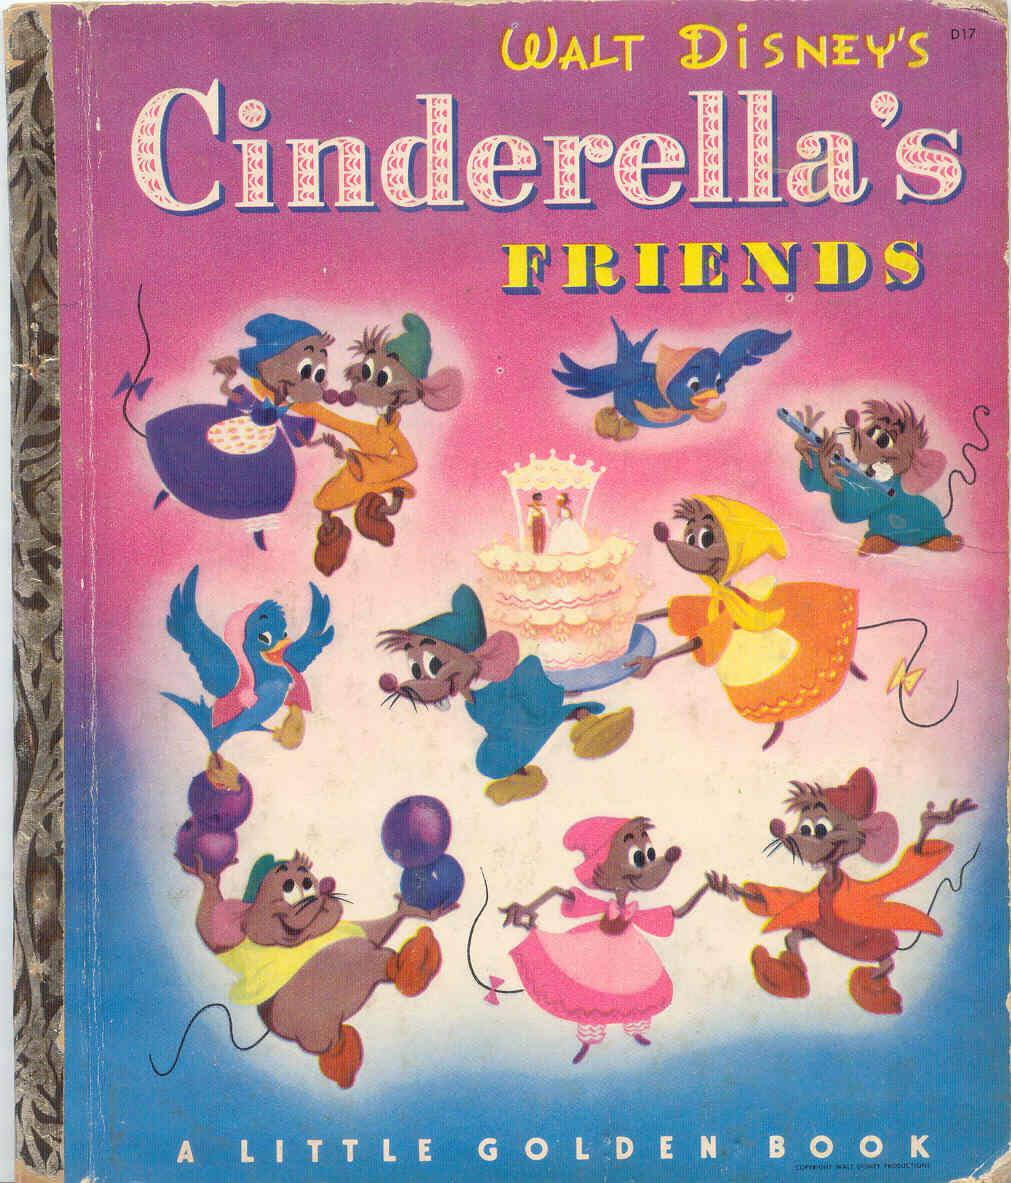 Disney Friendship Dress Cinderella: Gold Country Girls: My Disney Cinderella Books